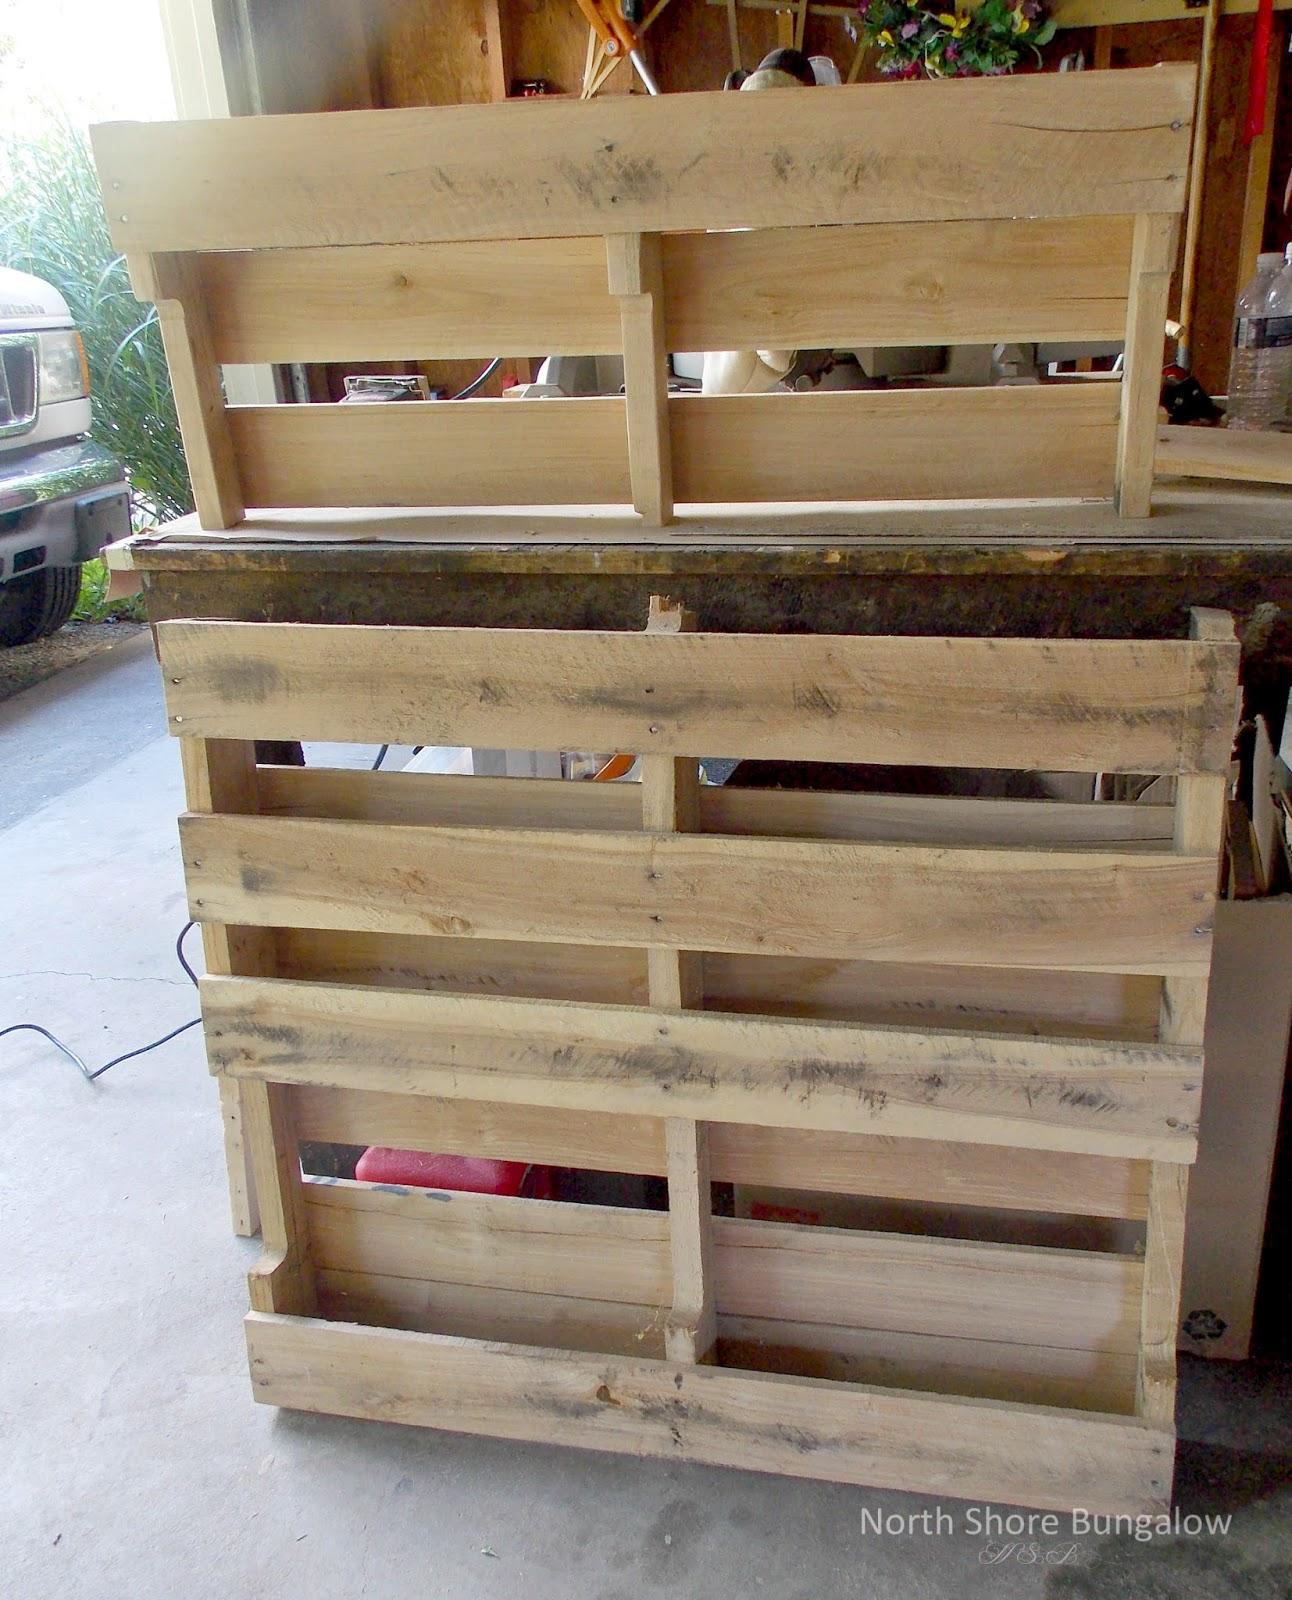 North Shore Bungalow DIY Wood Pallet Coat Rack